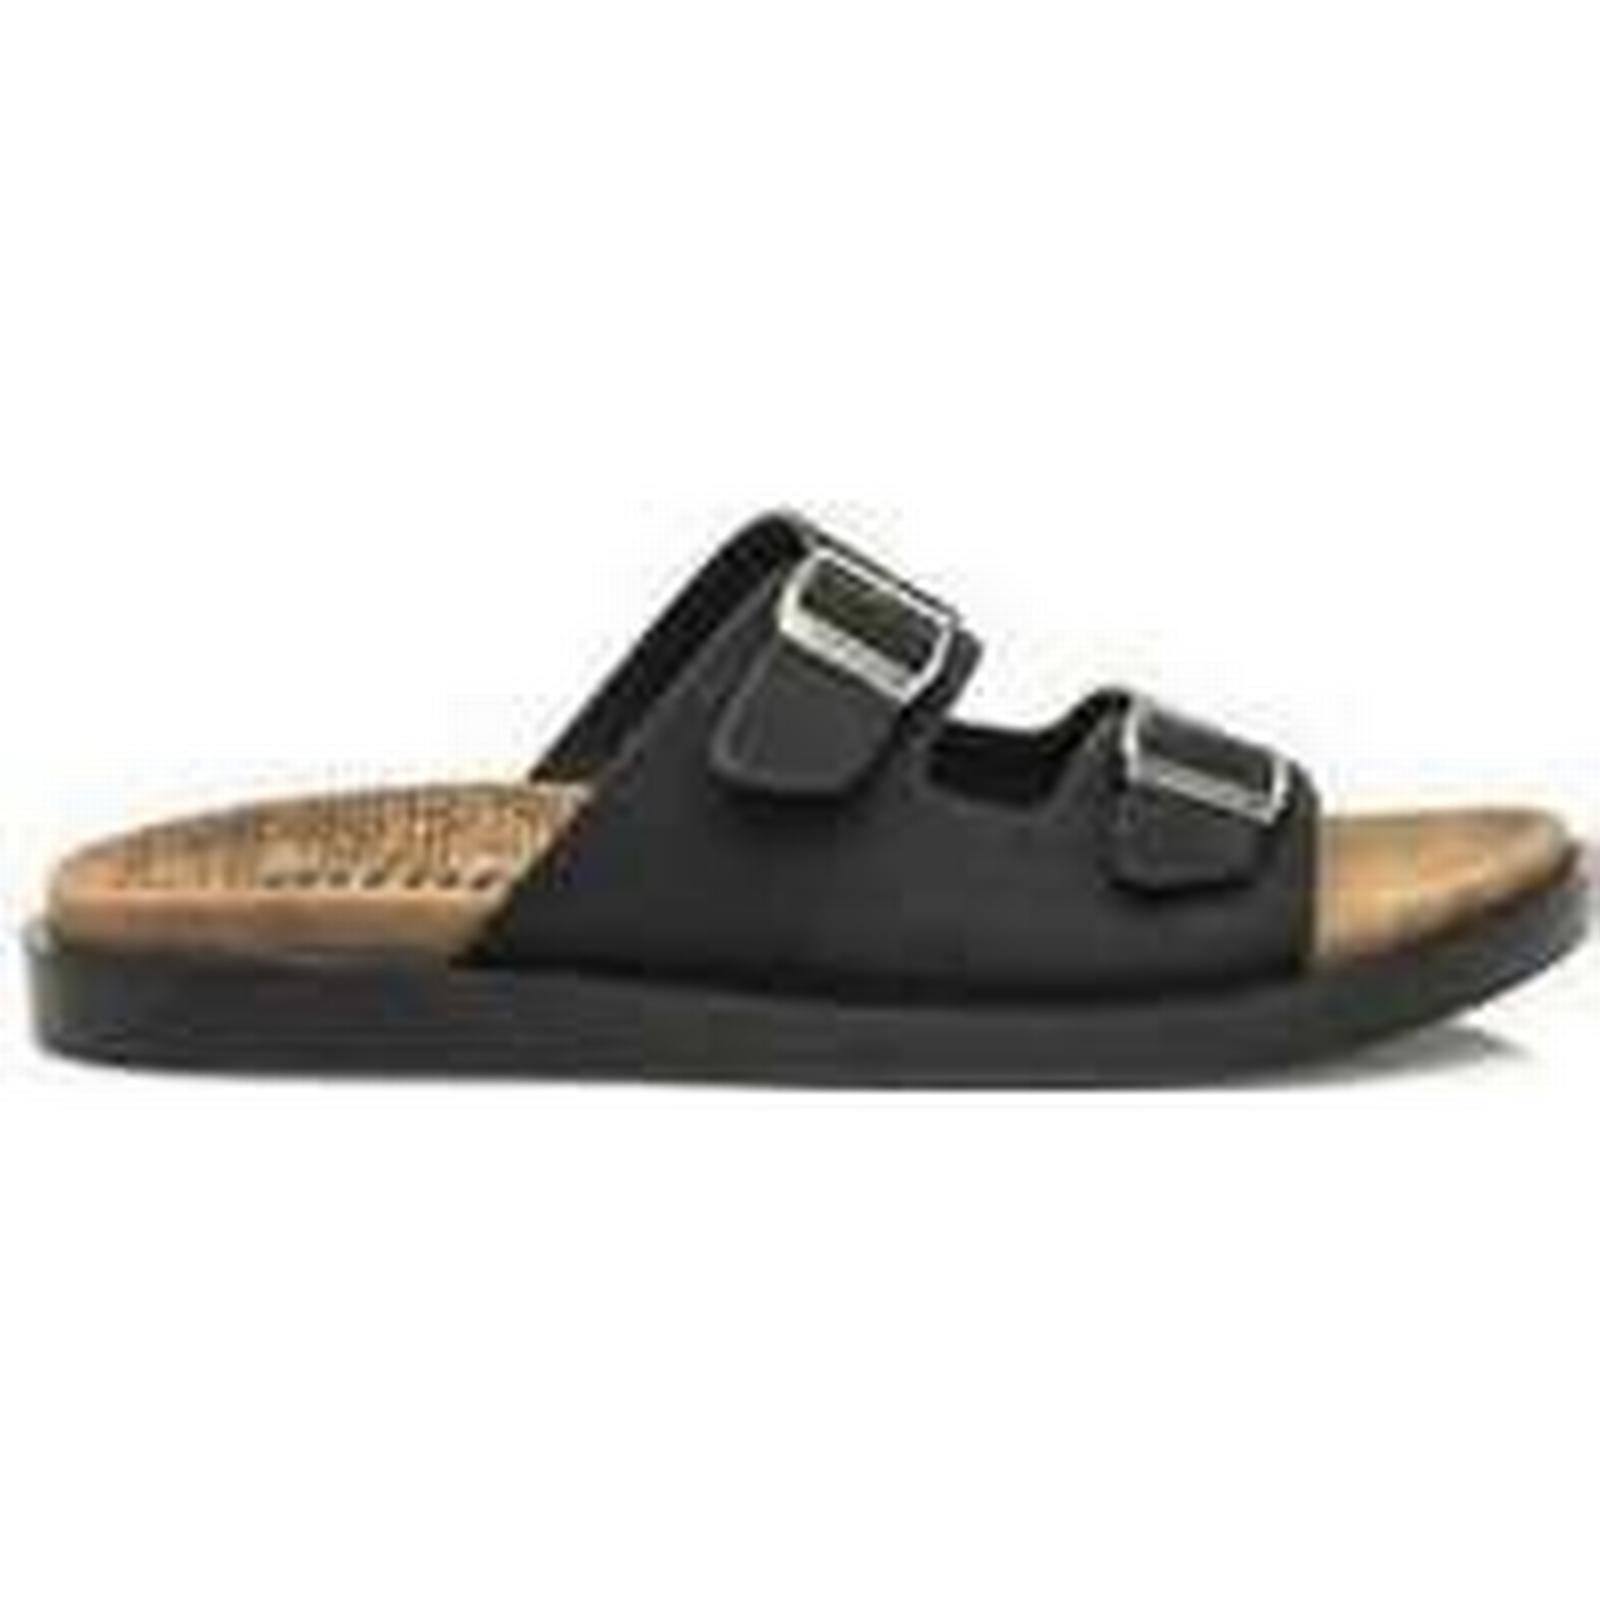 Spartoo.co.uk / MTNG CHANCLA X8-BLACK / VERTIGO TAN men's Mules / Spartoo.co.uk Casual Shoes in Black 56083f